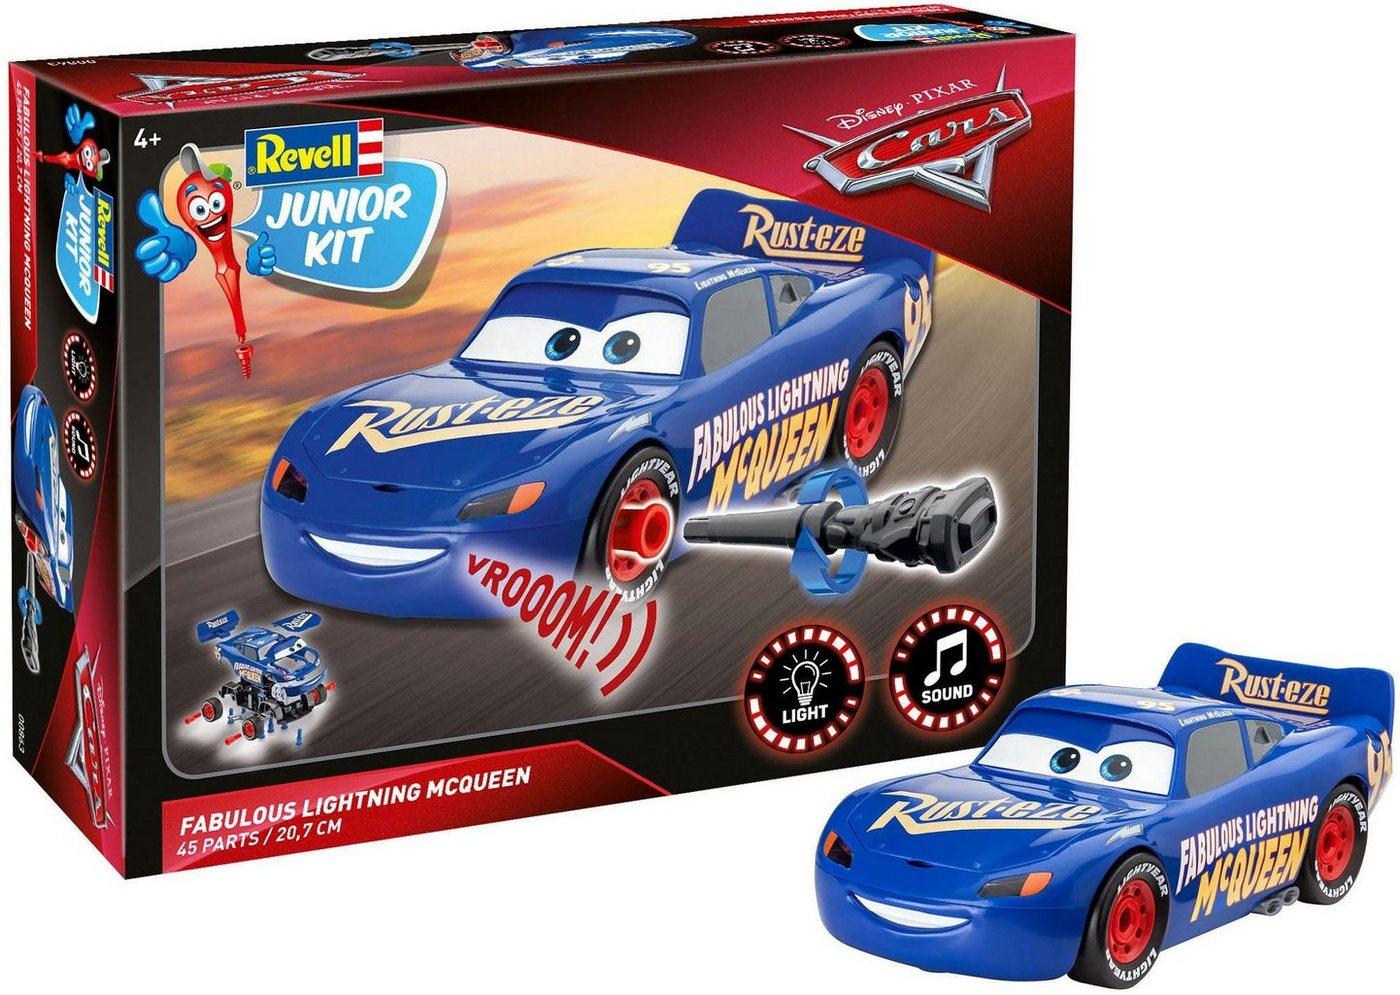 Revell Modellbausatz Auto m. Licht/Sound, »Junior Kit Disney Pixar Cars, Fabulous Lightning McQueen«